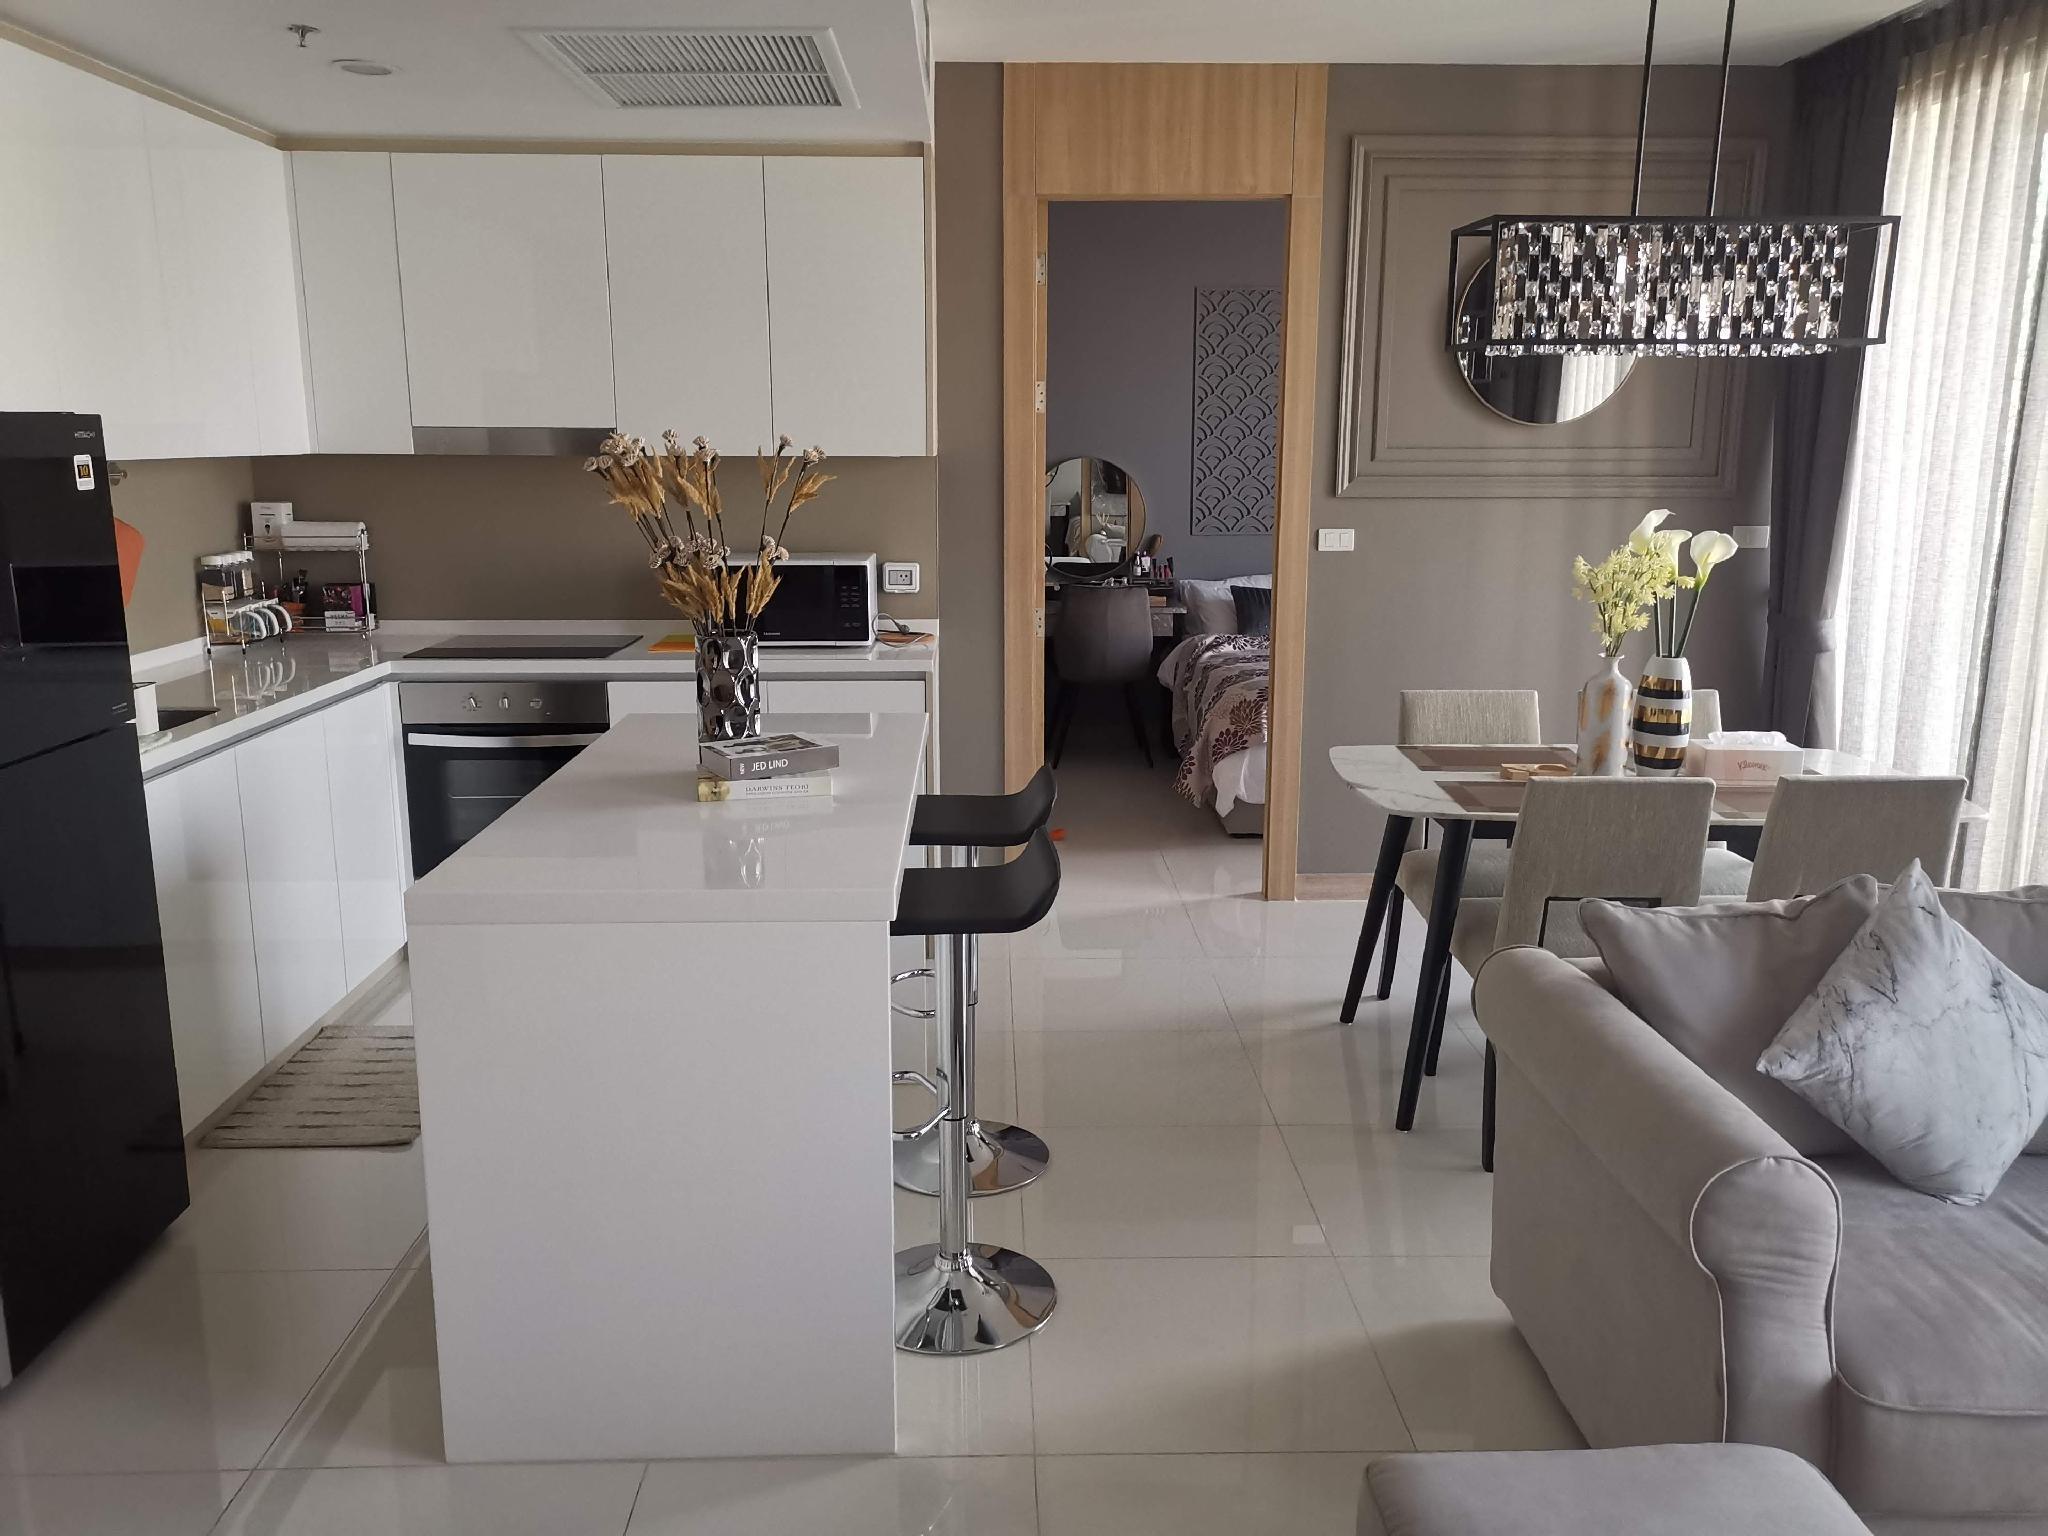 Fantastic Direct Sea View 2BR @ Luxurious Riviera อพาร์ตเมนต์ 2 ห้องนอน 2 ห้องน้ำส่วนตัว ขนาด 78 ตร.ม. – หาดวงอมาตย์